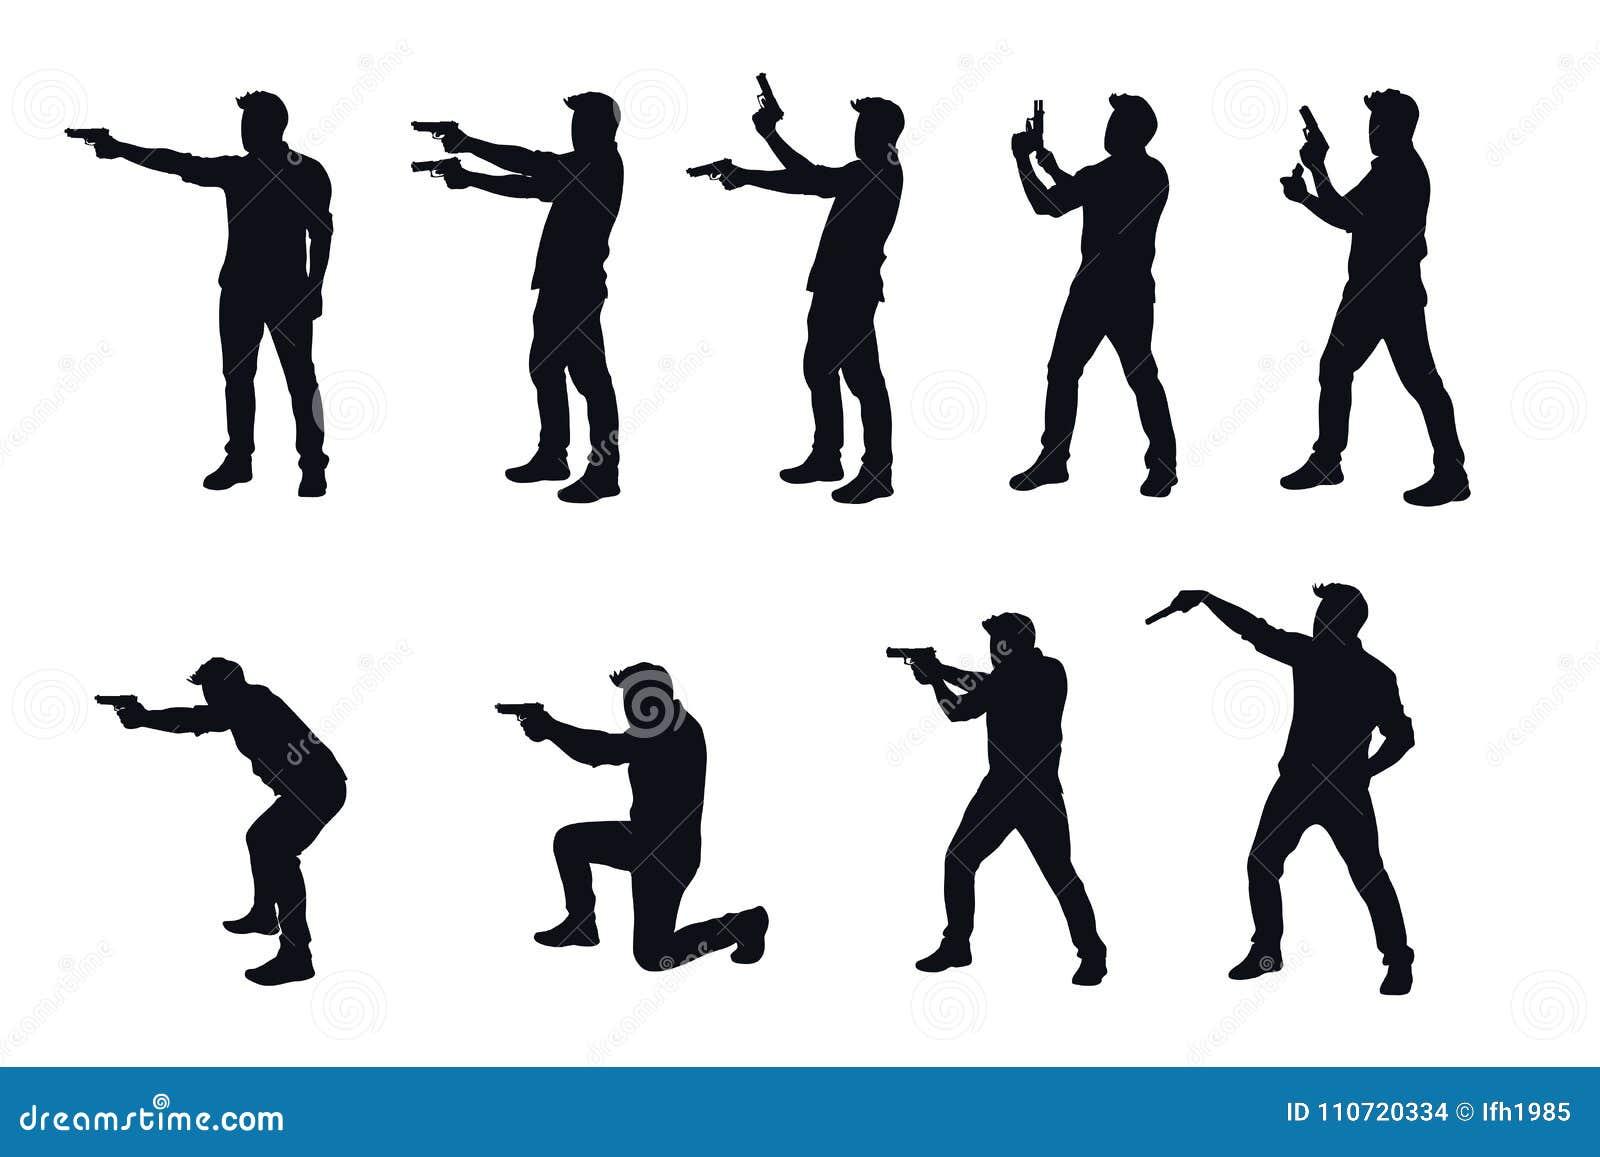 Silhouette Person Holding Gun Stock Illustrations 141 Silhouette Person Holding Gun Stock Illustrations Vectors Clipart Dreamstime